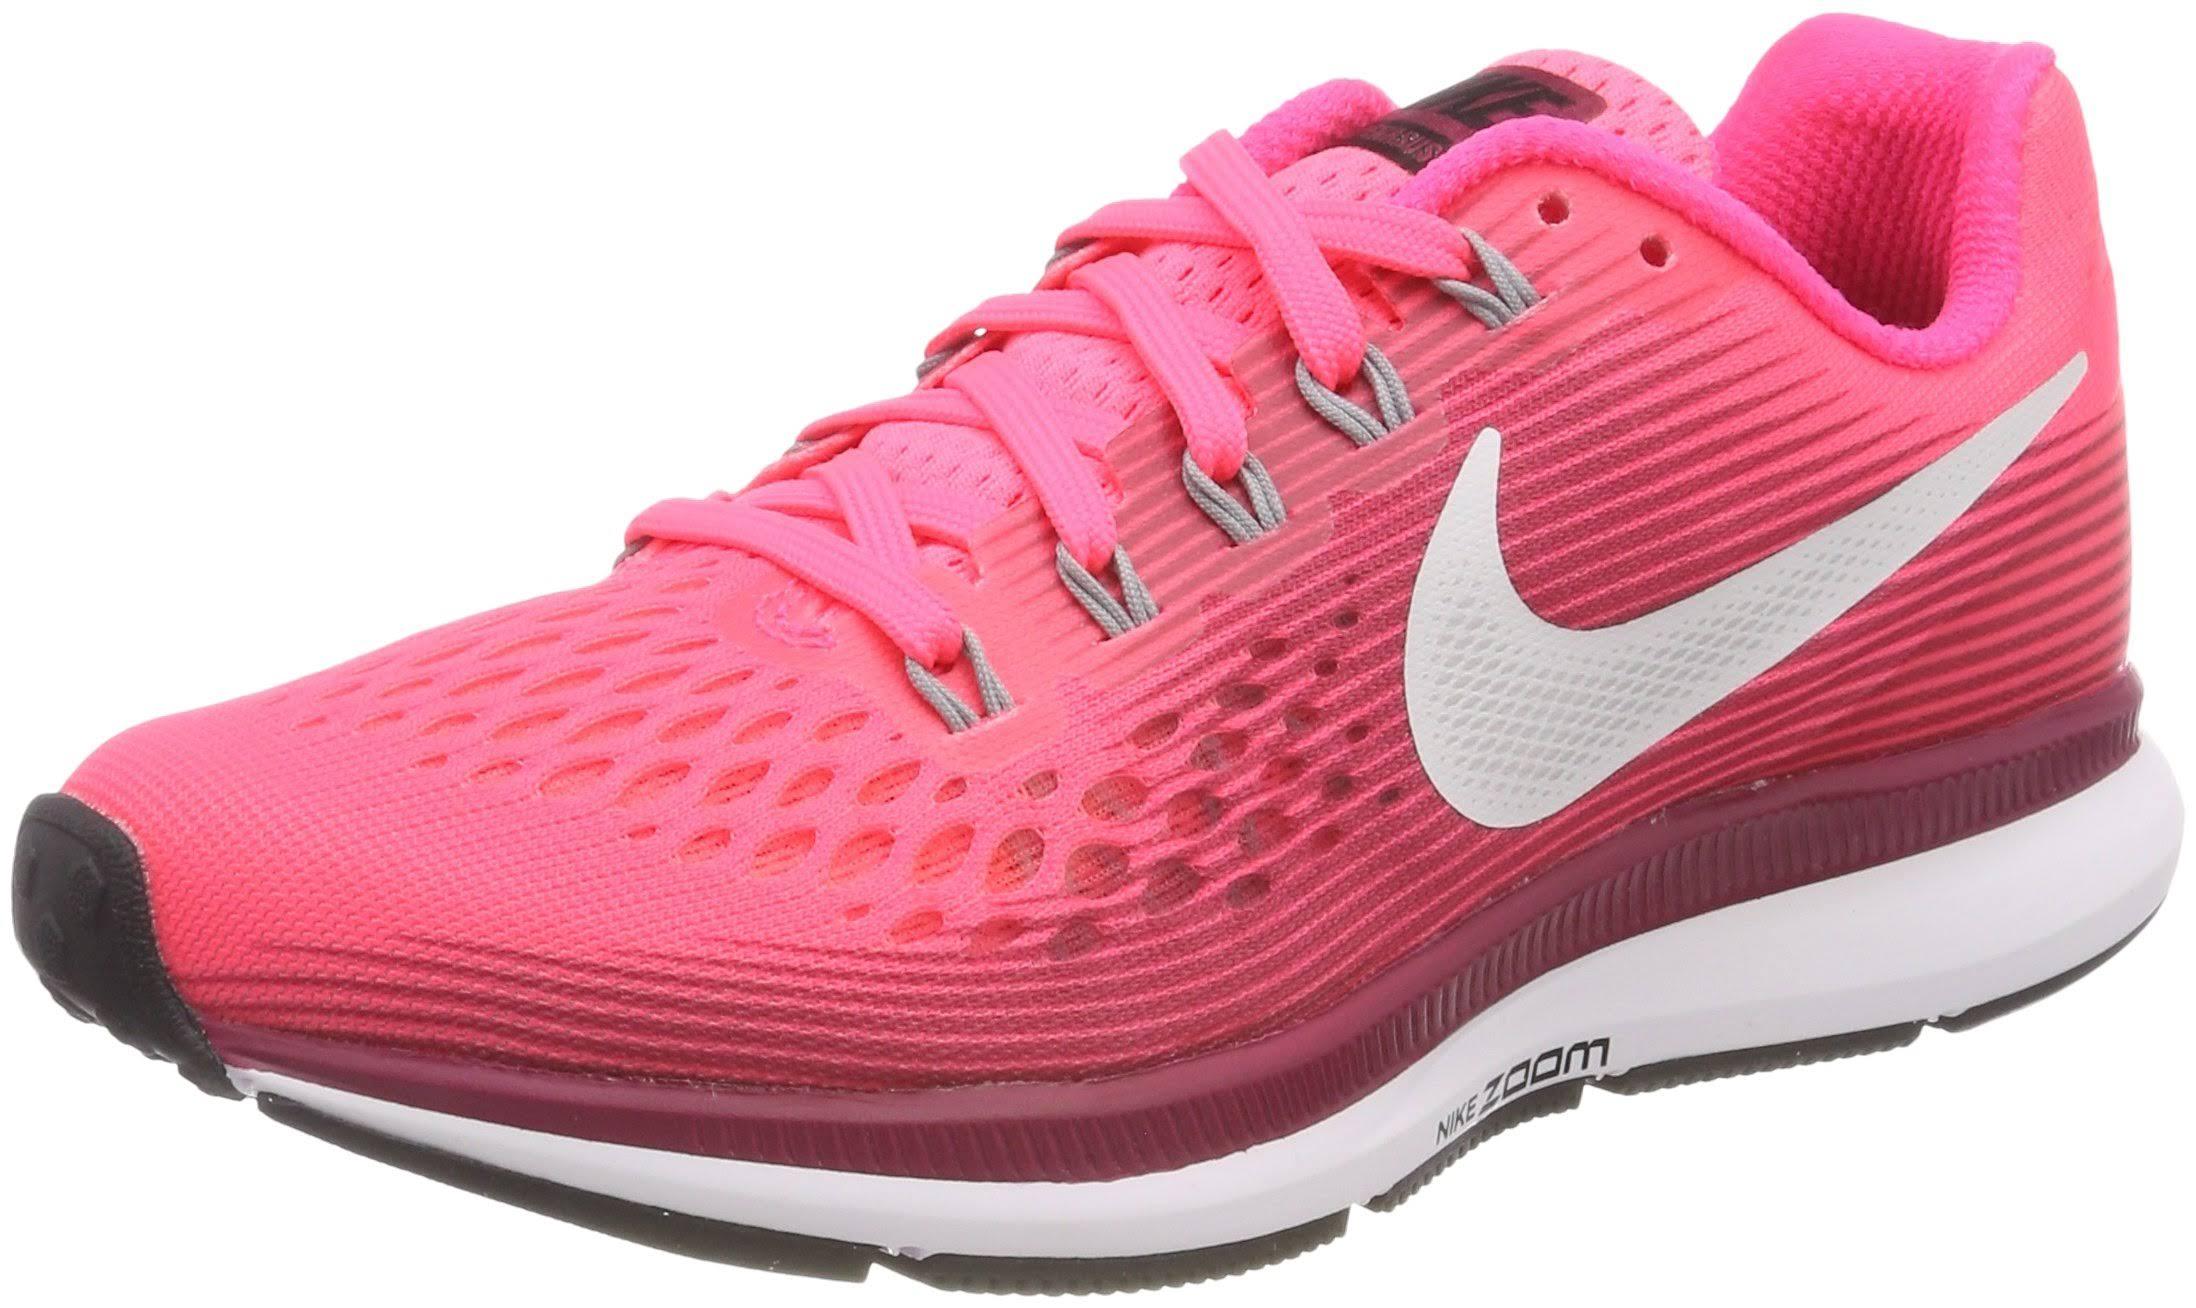 Zoom hardloopschoenen Nike Wmns Pegasus Air 34 rood Concurrentie CexdBo